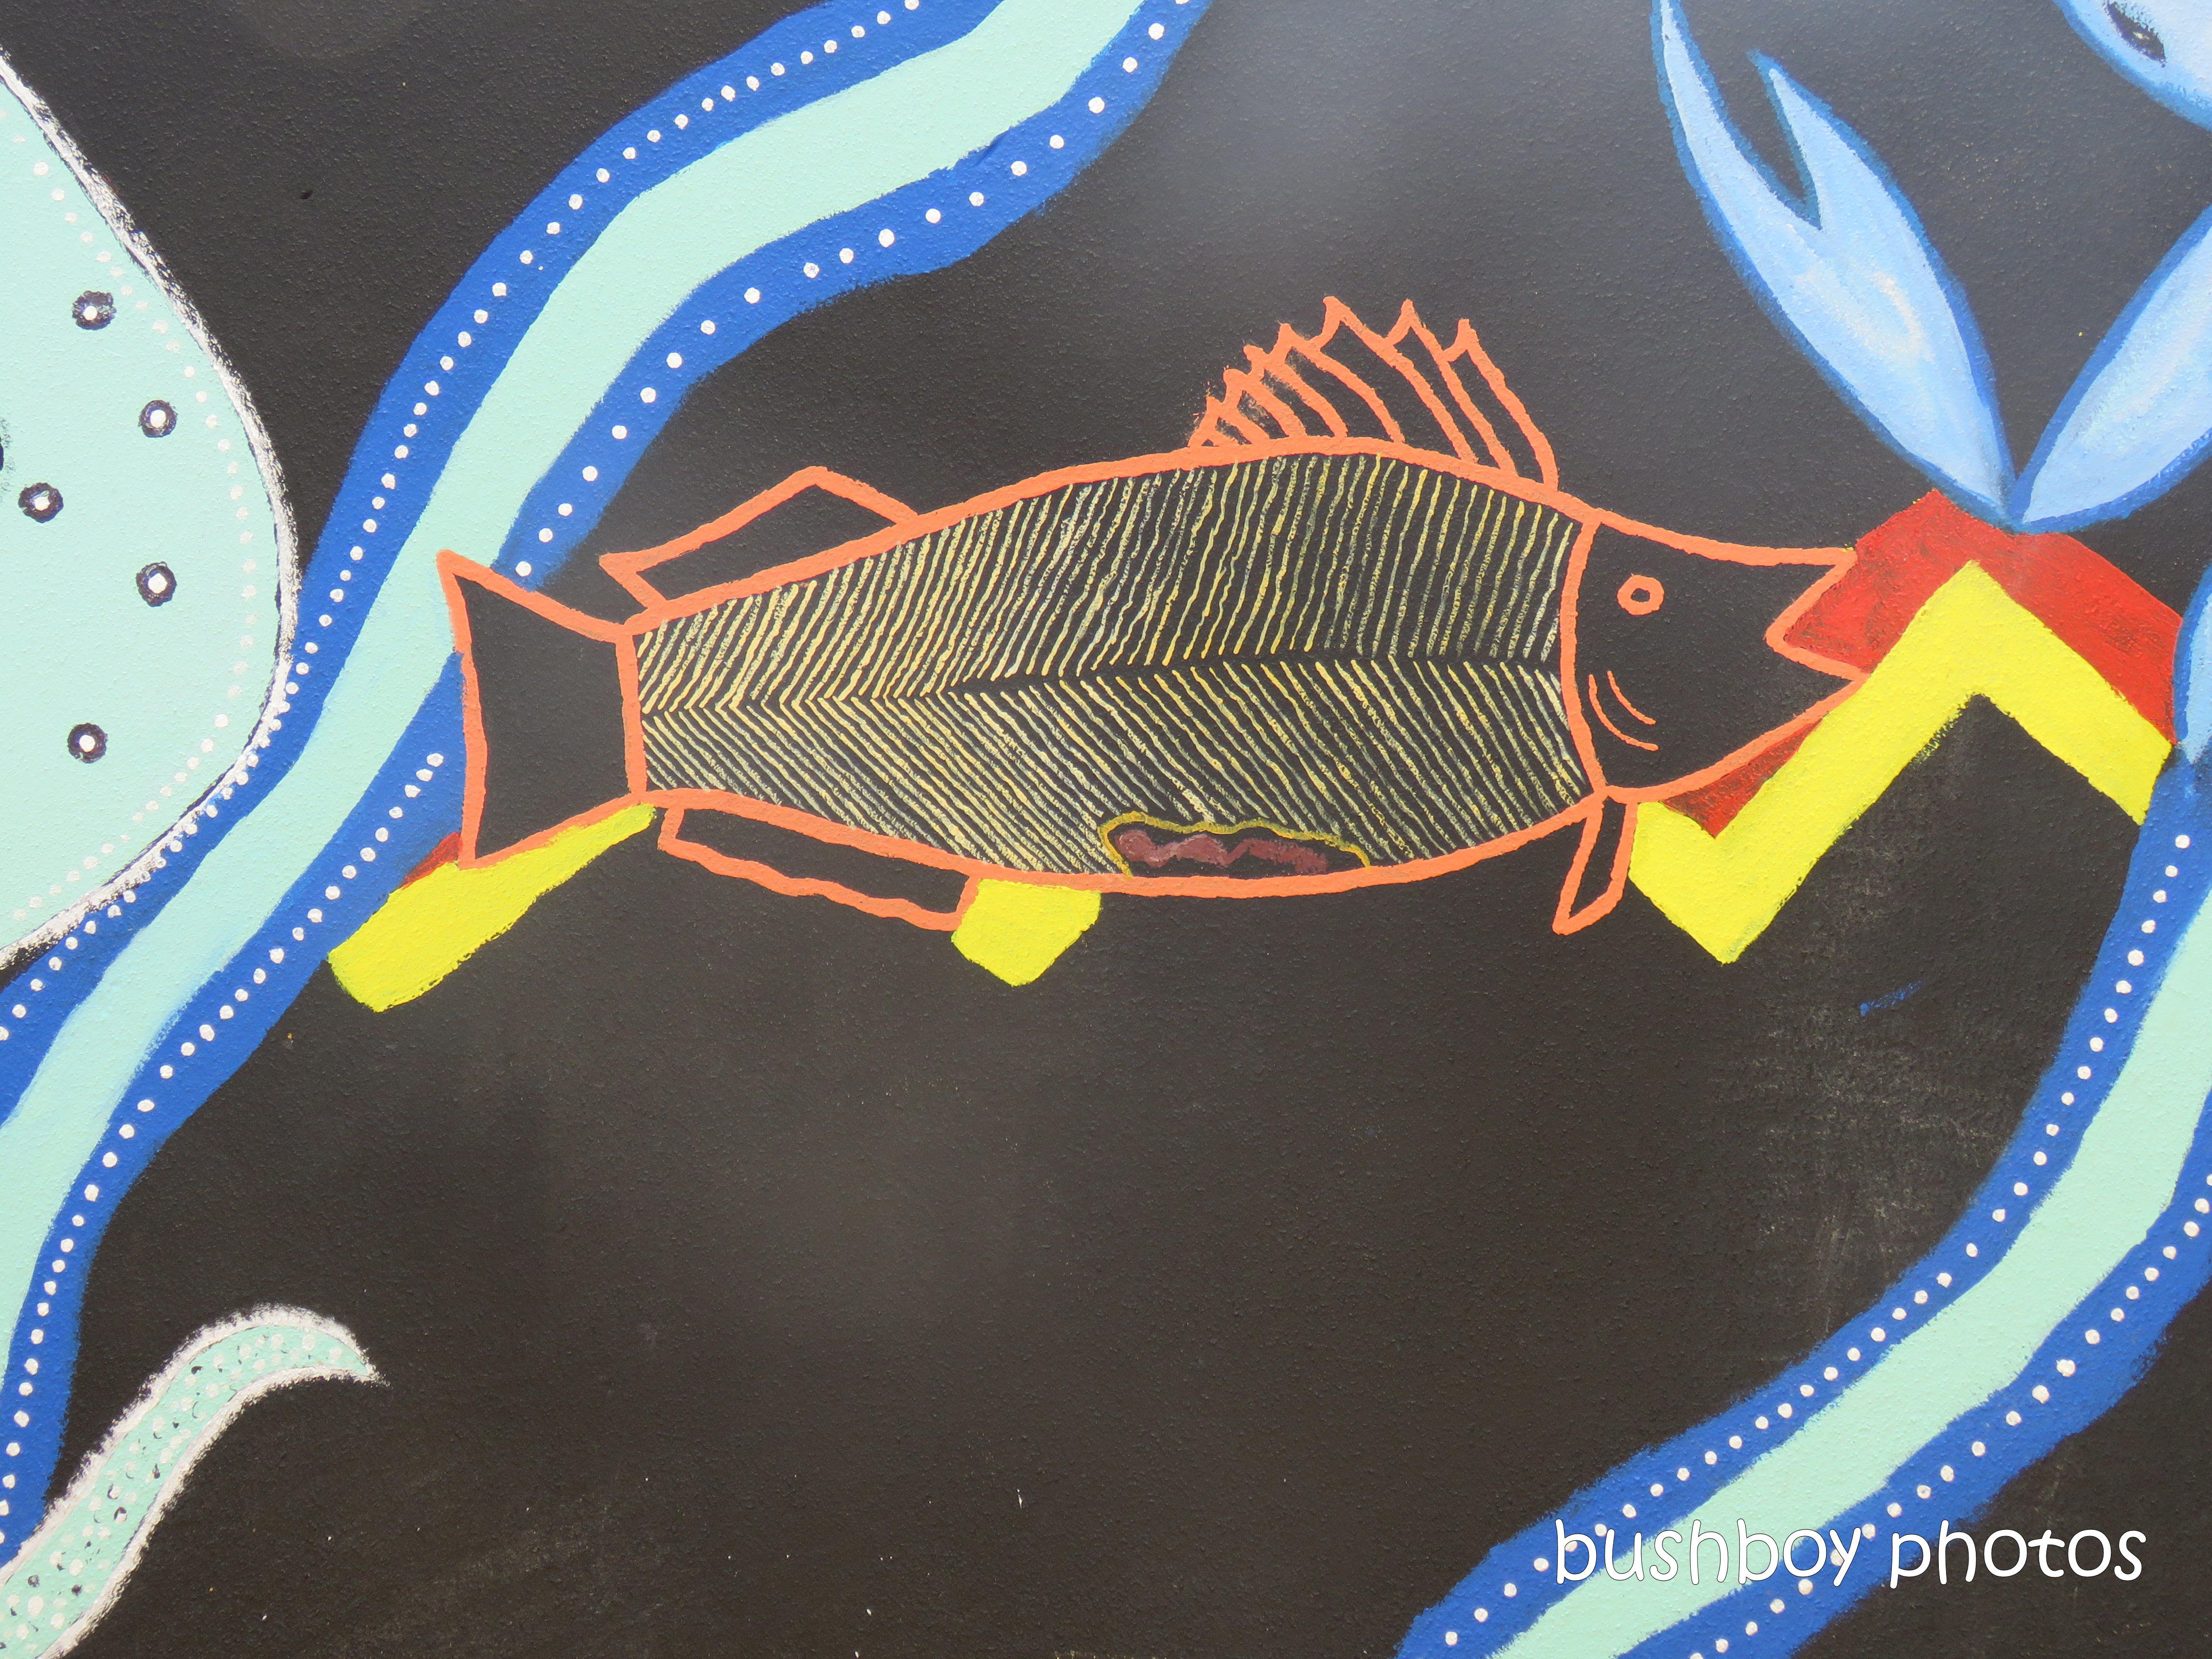 street_art15_indigenous_named_toowoomba_jan 2019